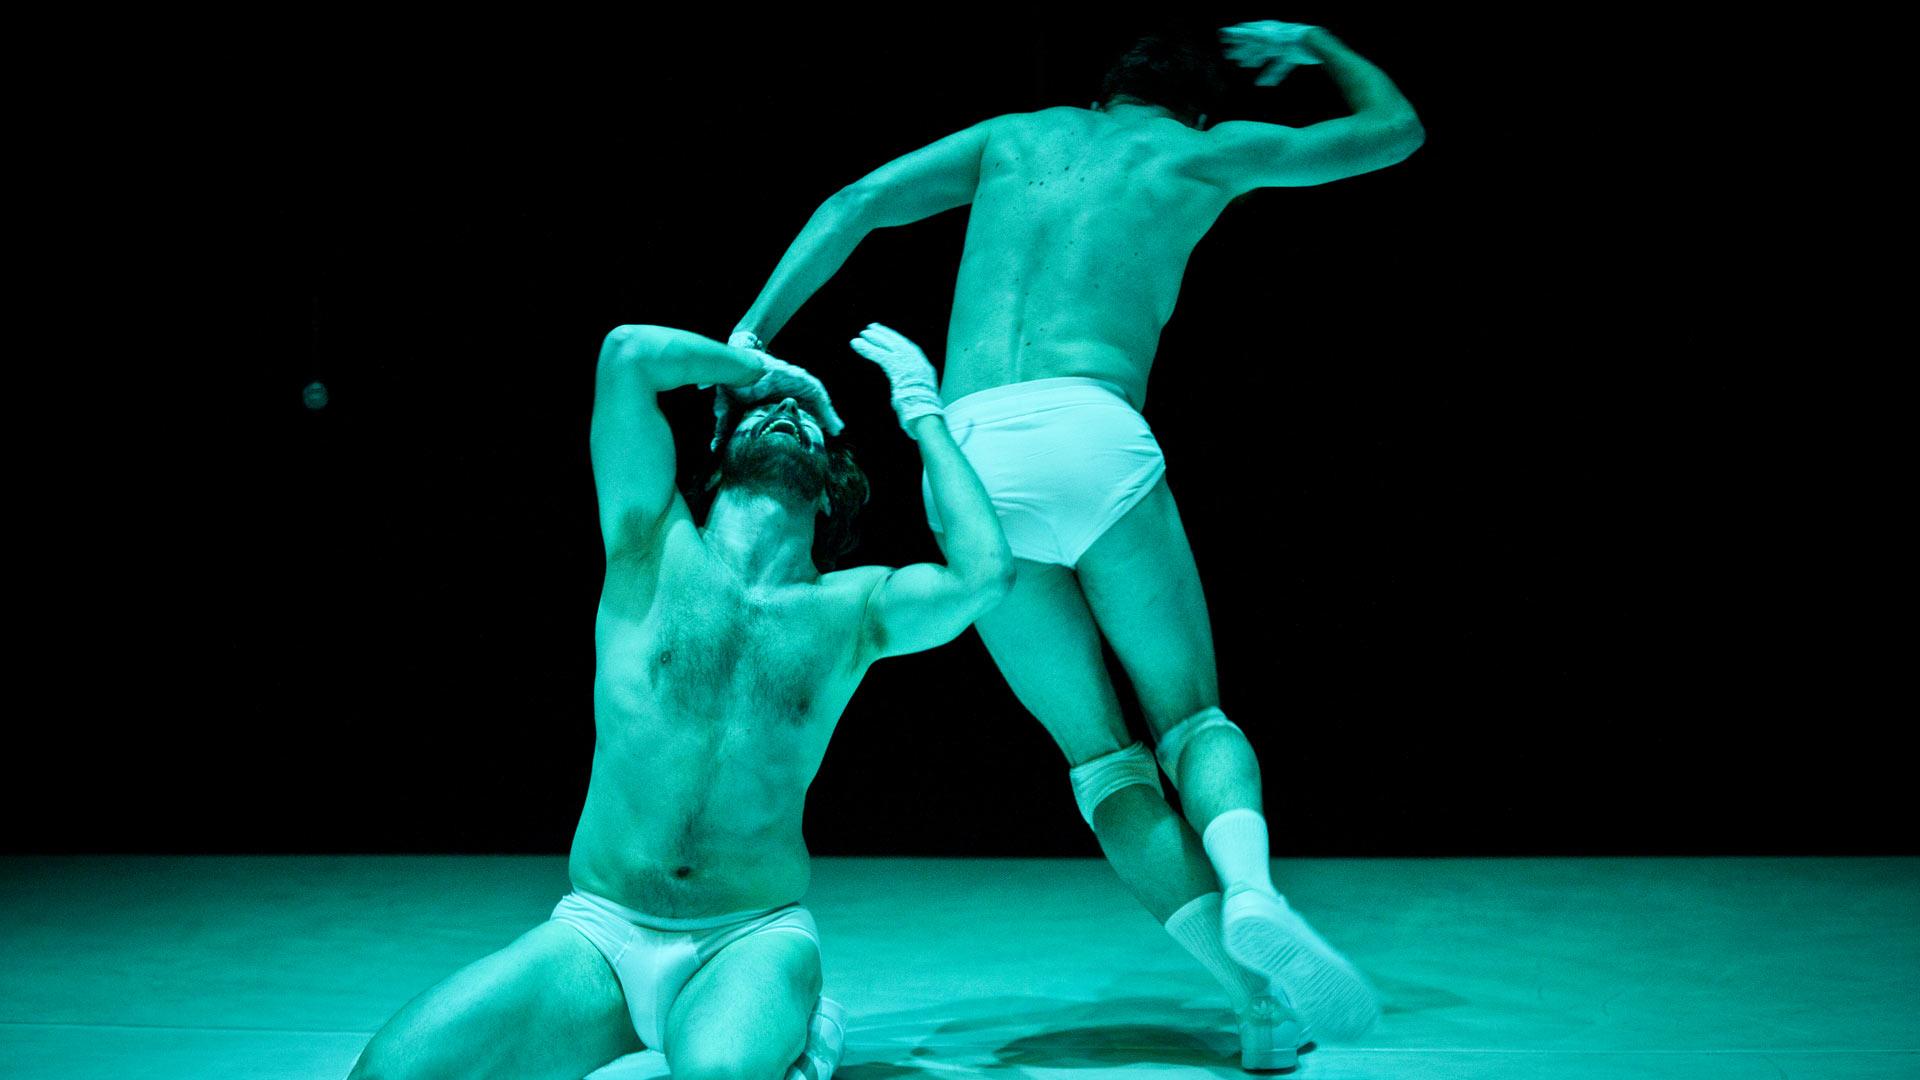 Danse Mutante | Mayday | Francis Ducharme, Riley Sims © Mathieu Doyon @ Agora de la danse, Montreal.